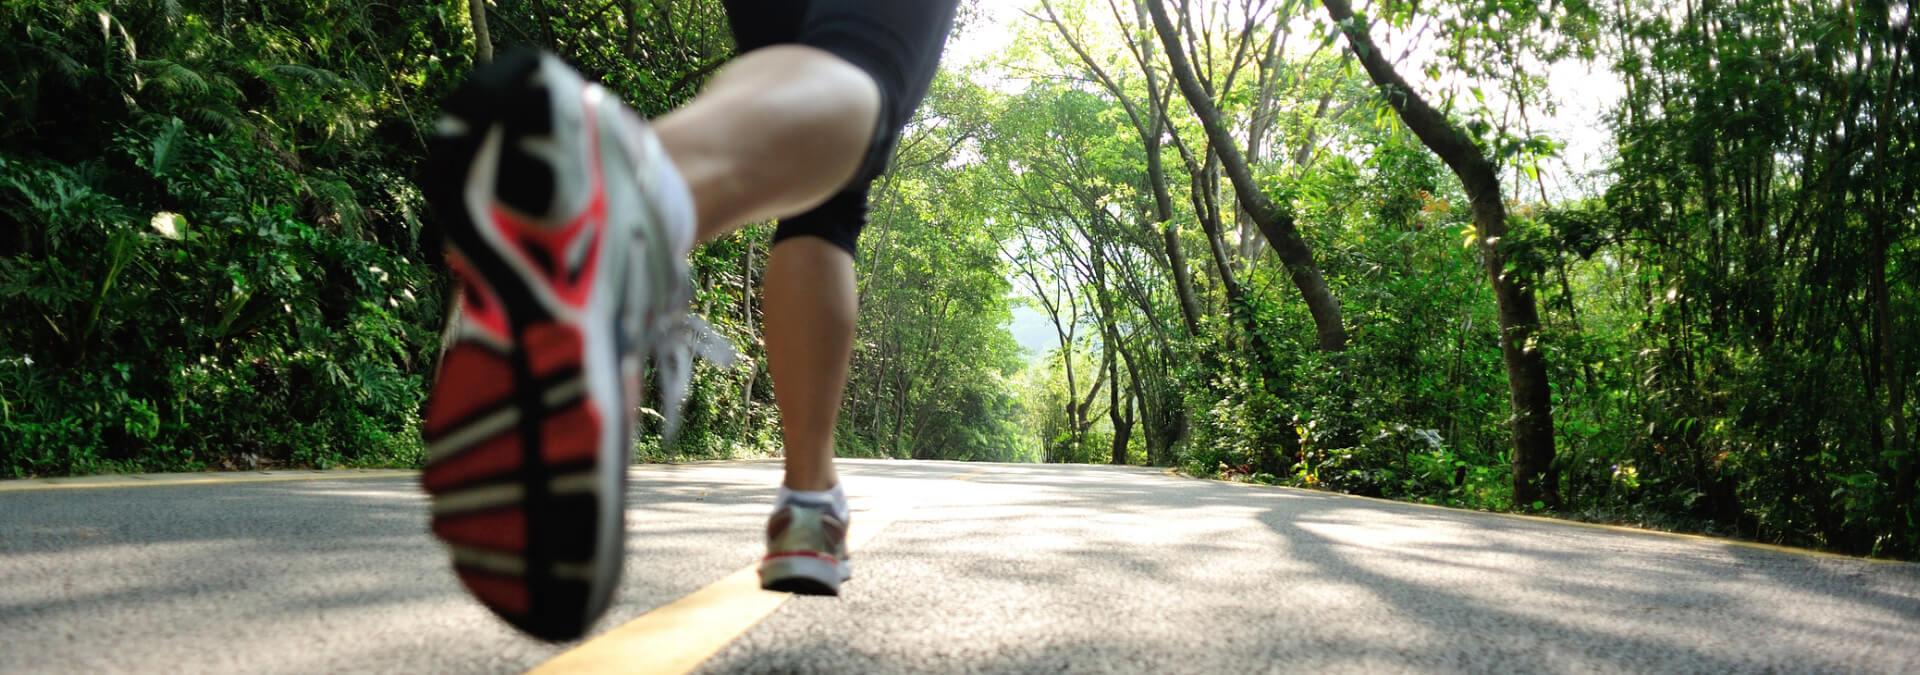 healthy_lifestyle_fitness_running_1.jpg